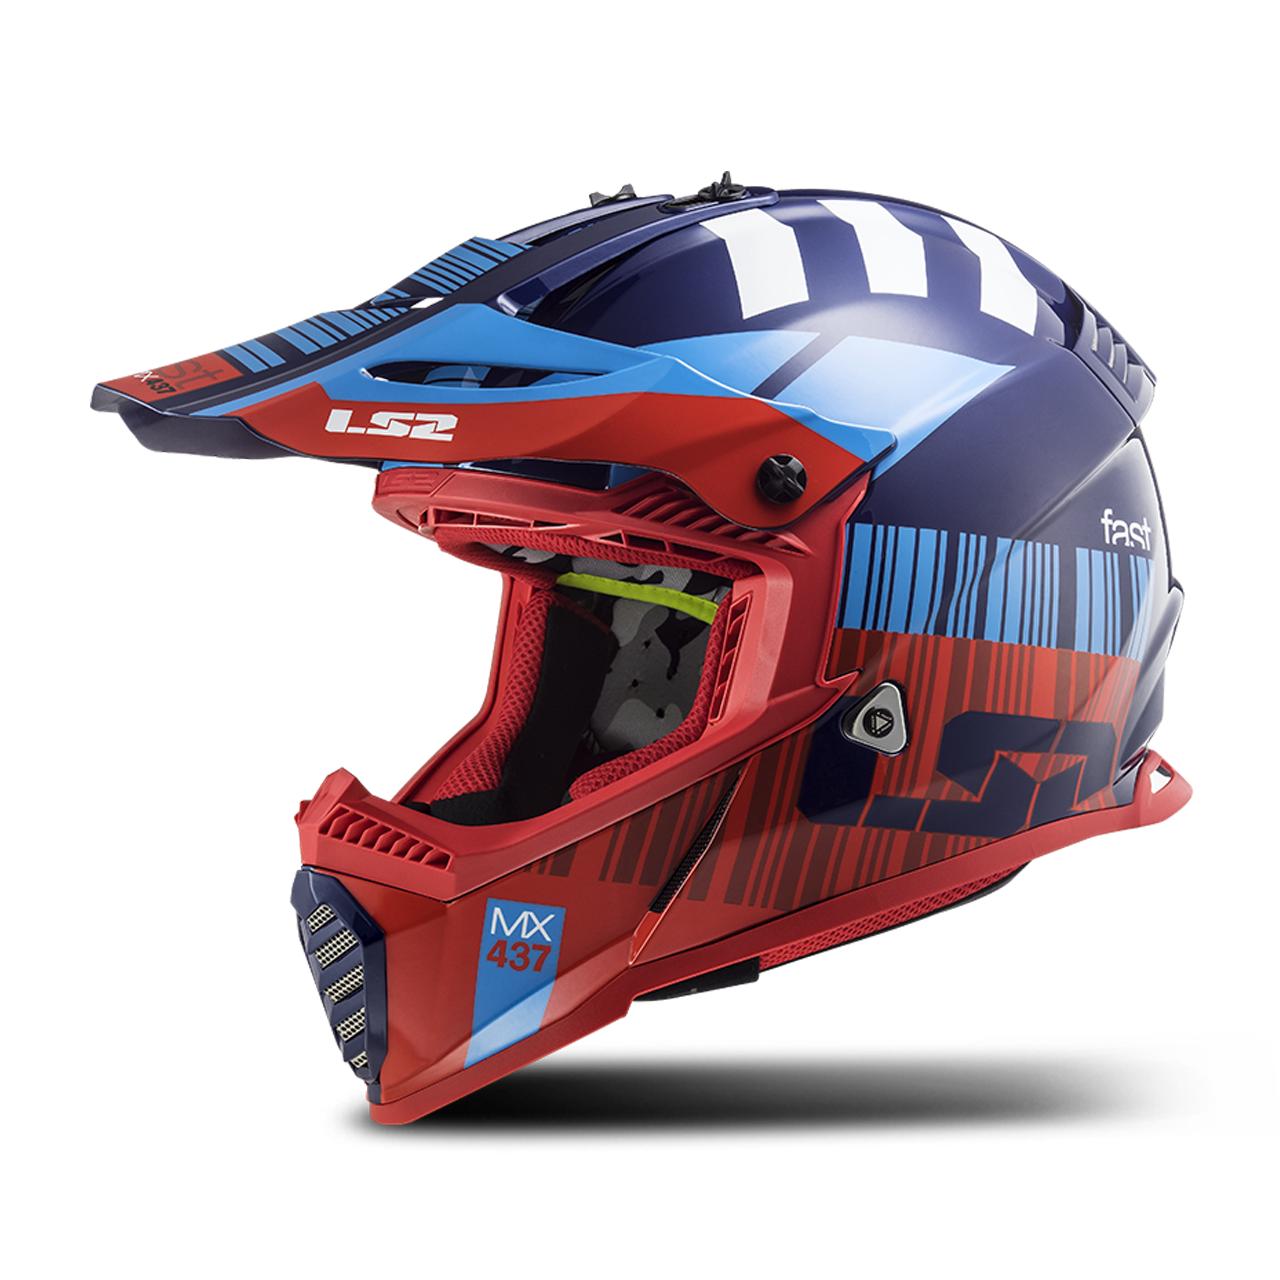 LS2 Casco Cross  MX437 Fast Evo Xcode Rosso-Blu